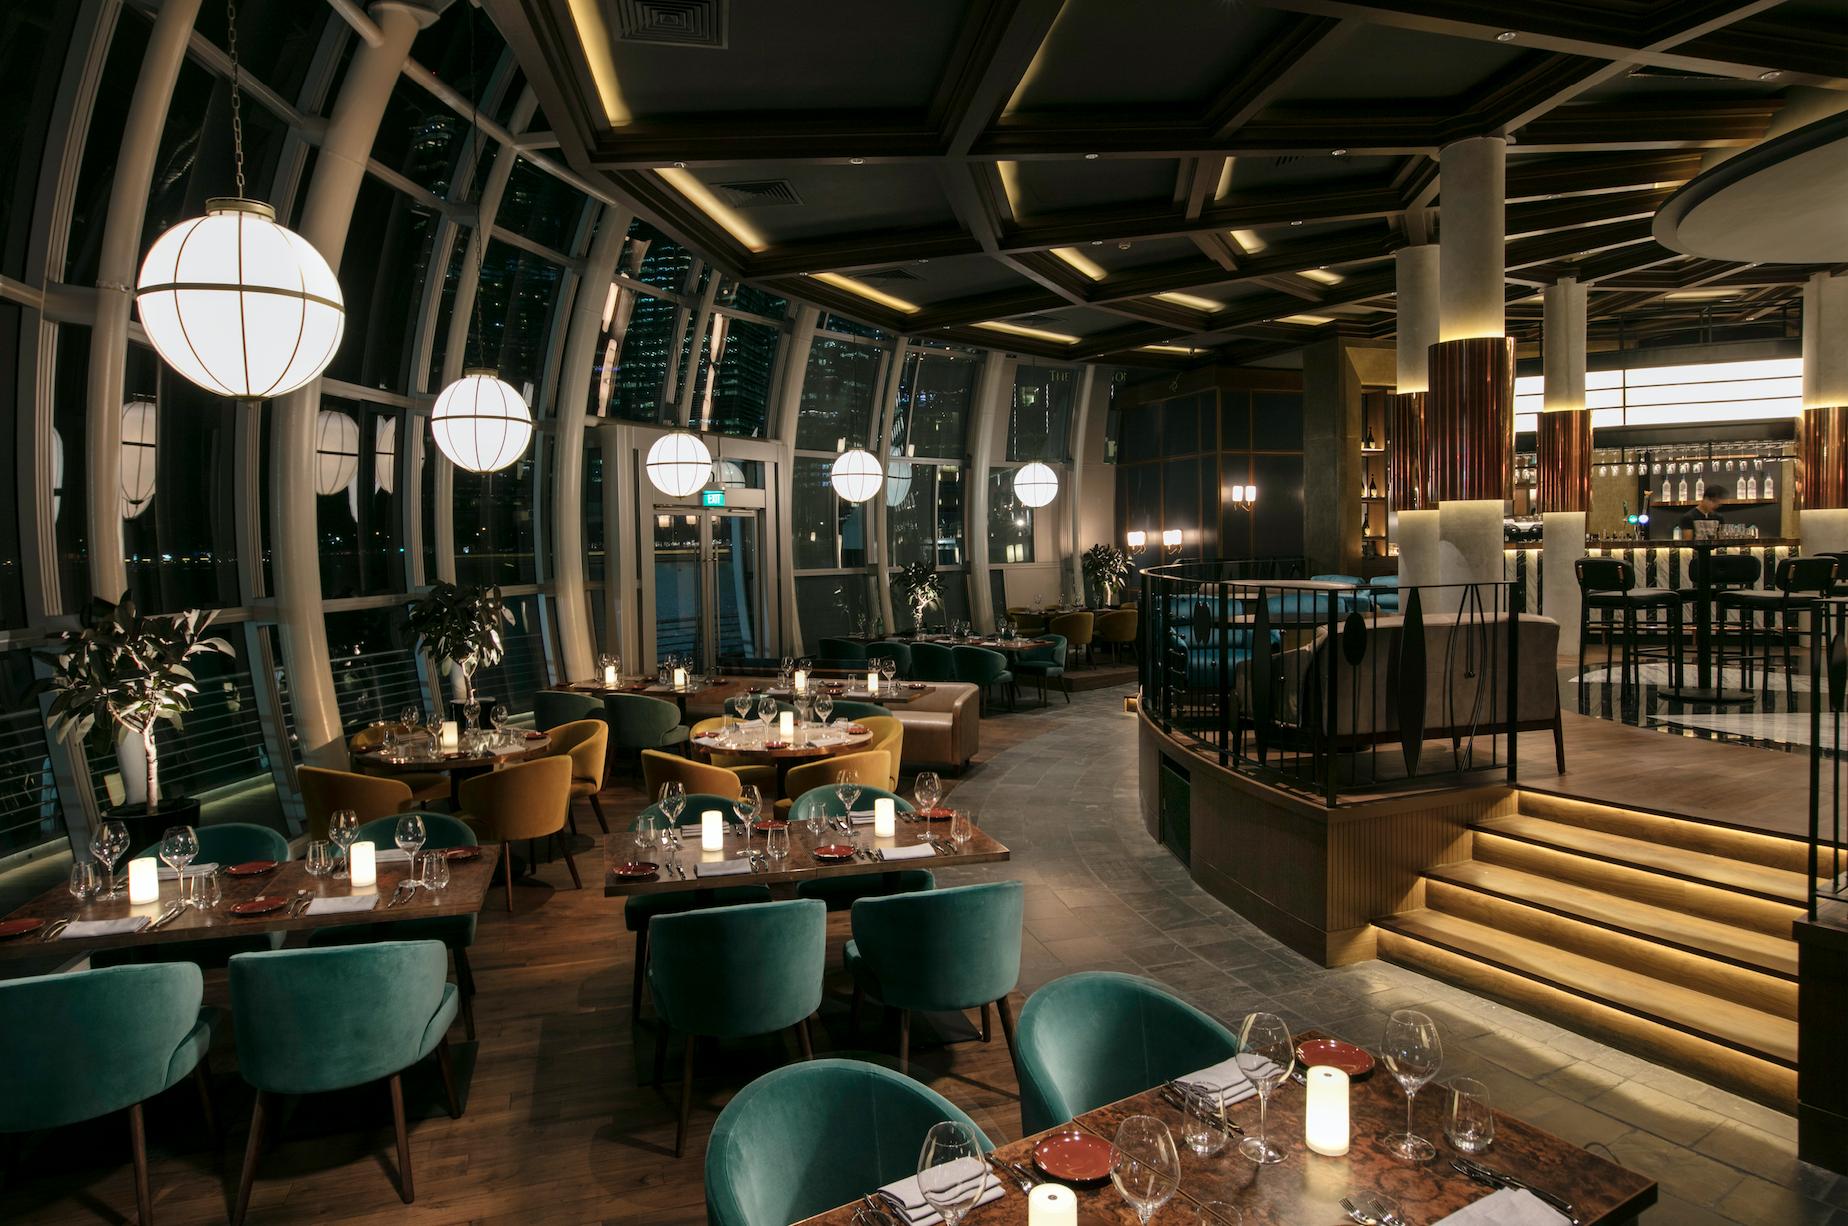 Monti Modern Italian Cuisine On The River LifestyleAsia Singapore